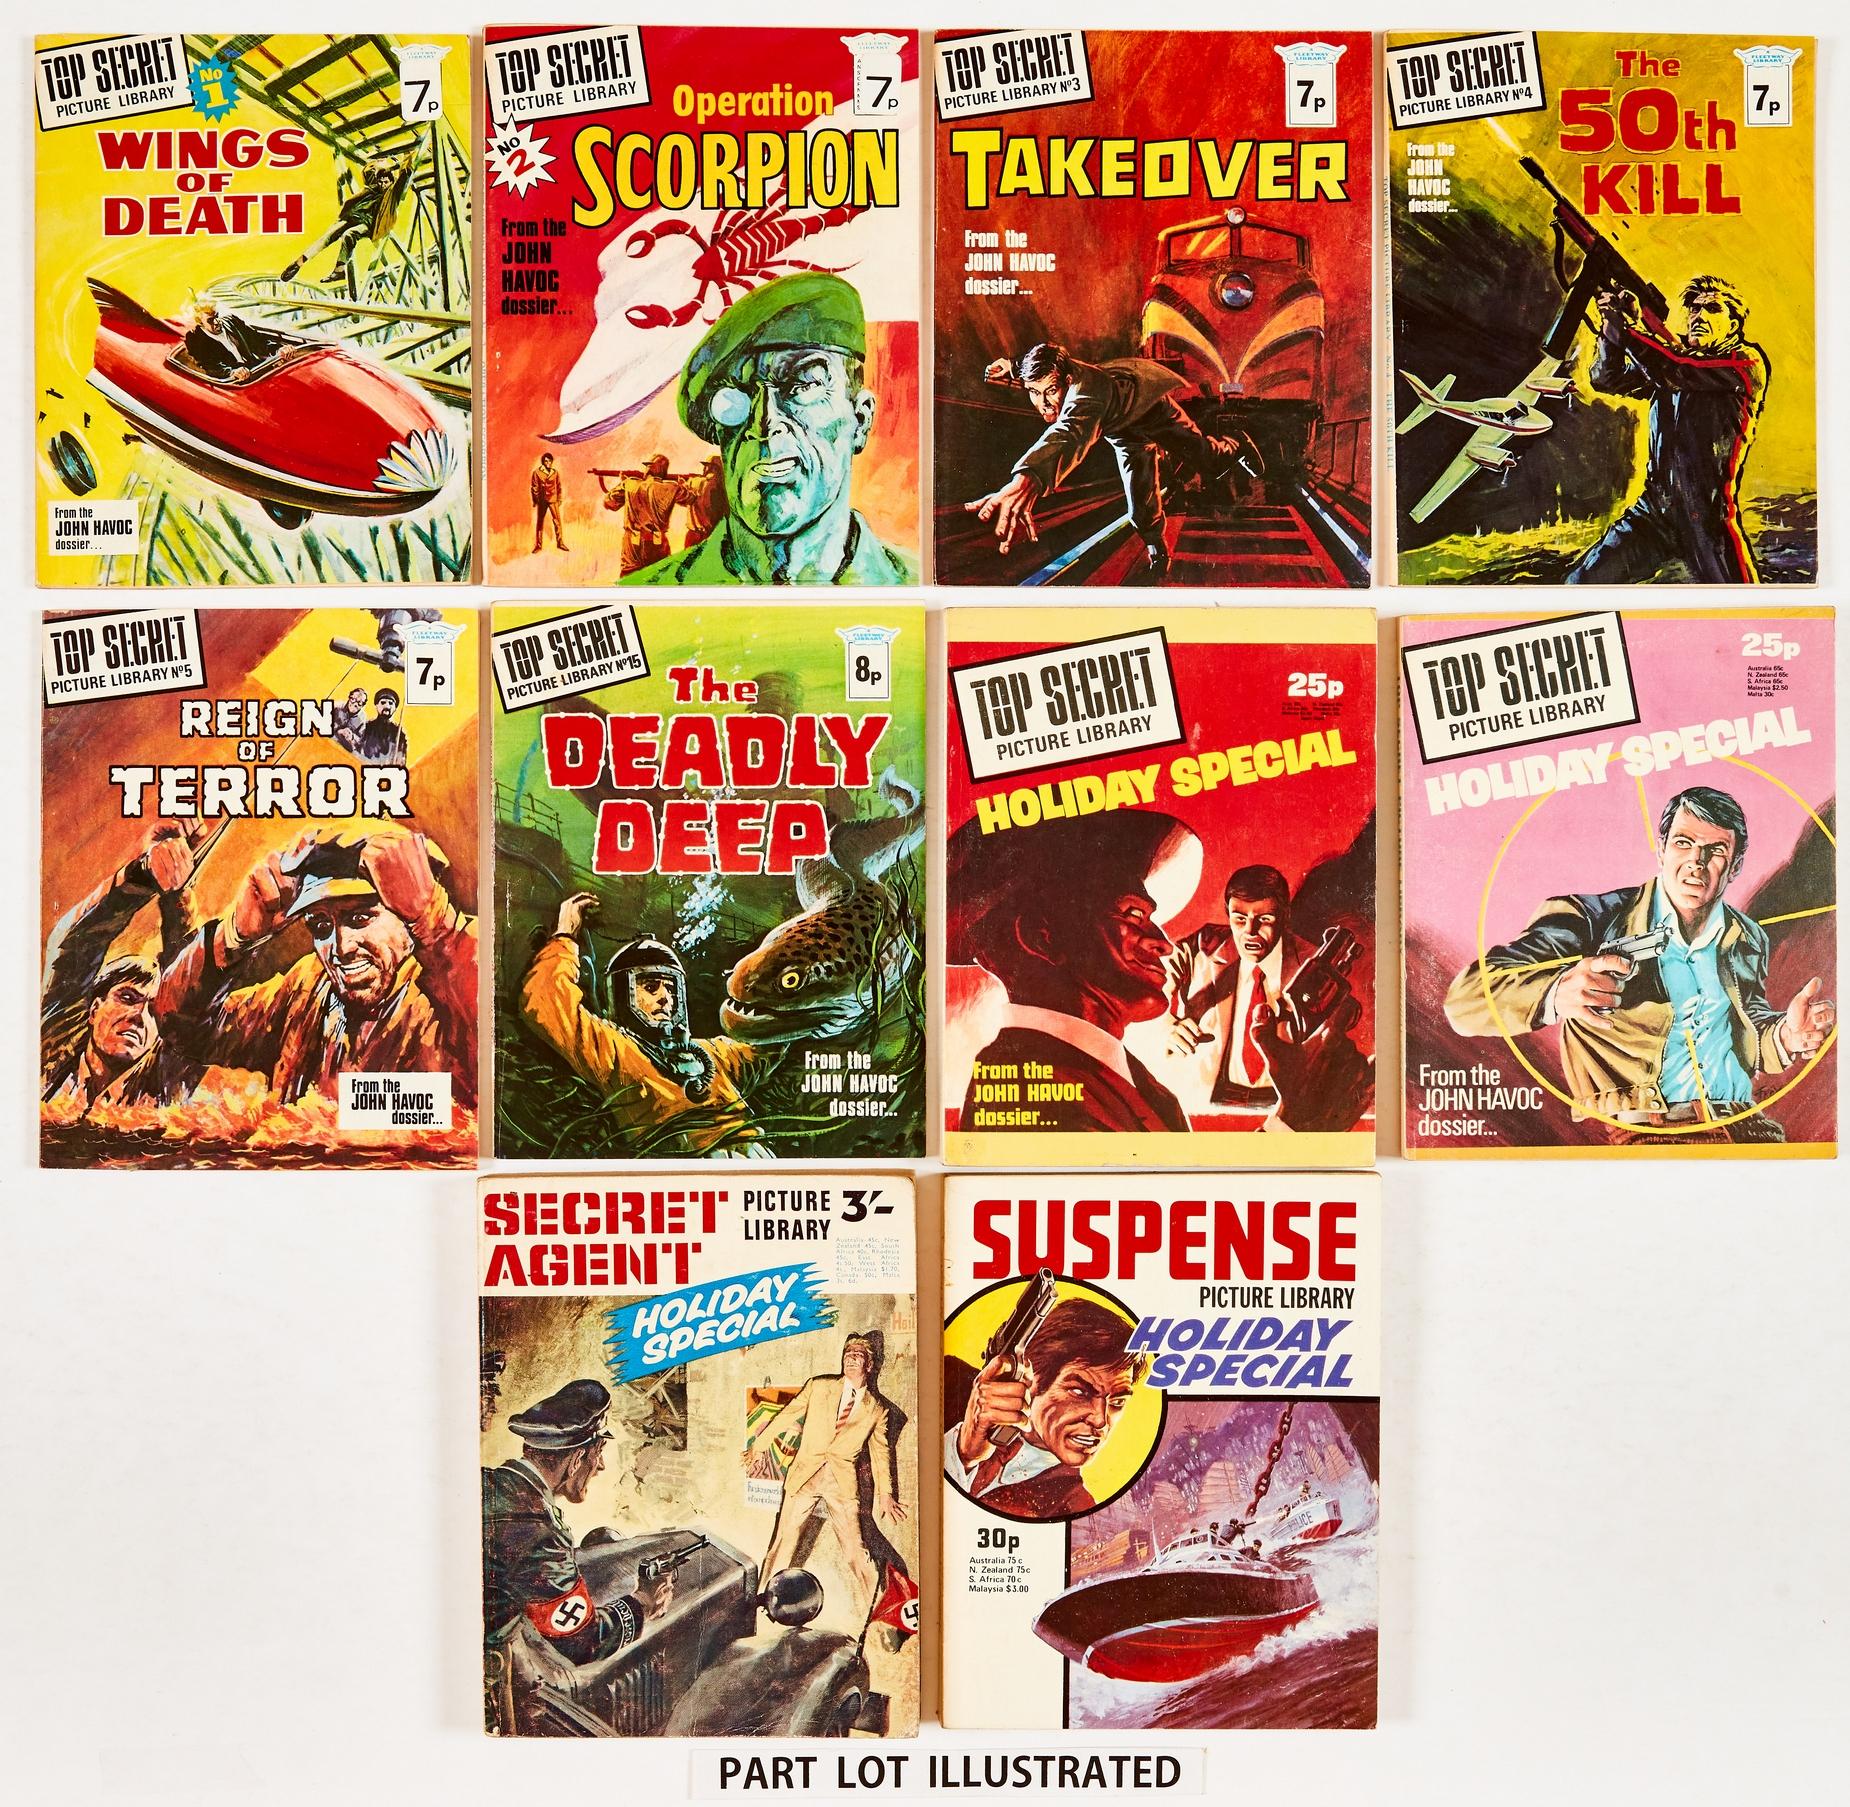 Top Secret Picture Library (1974-76) 1-40. Complete run [vfn/vfn+] with Top Secret Picture Library